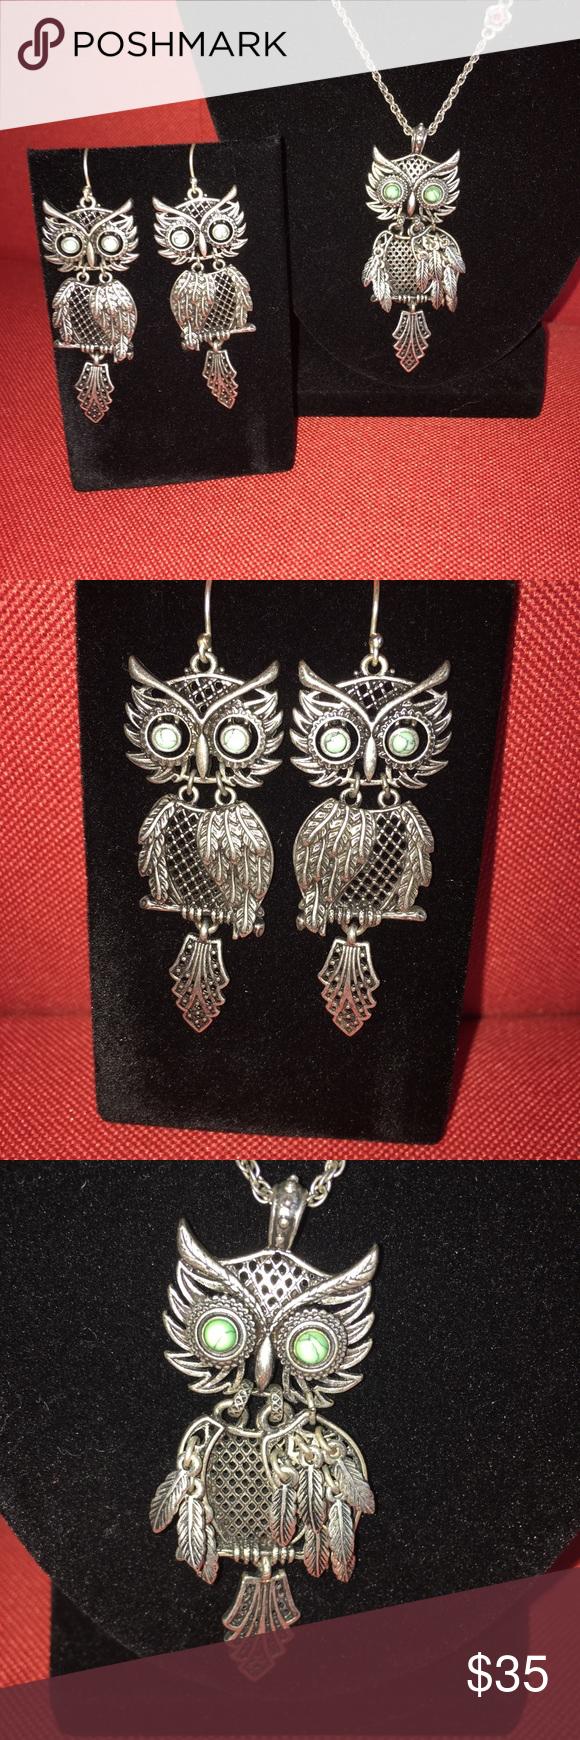 Lucky Brand Owl Jewelry Set Adorable Shaky